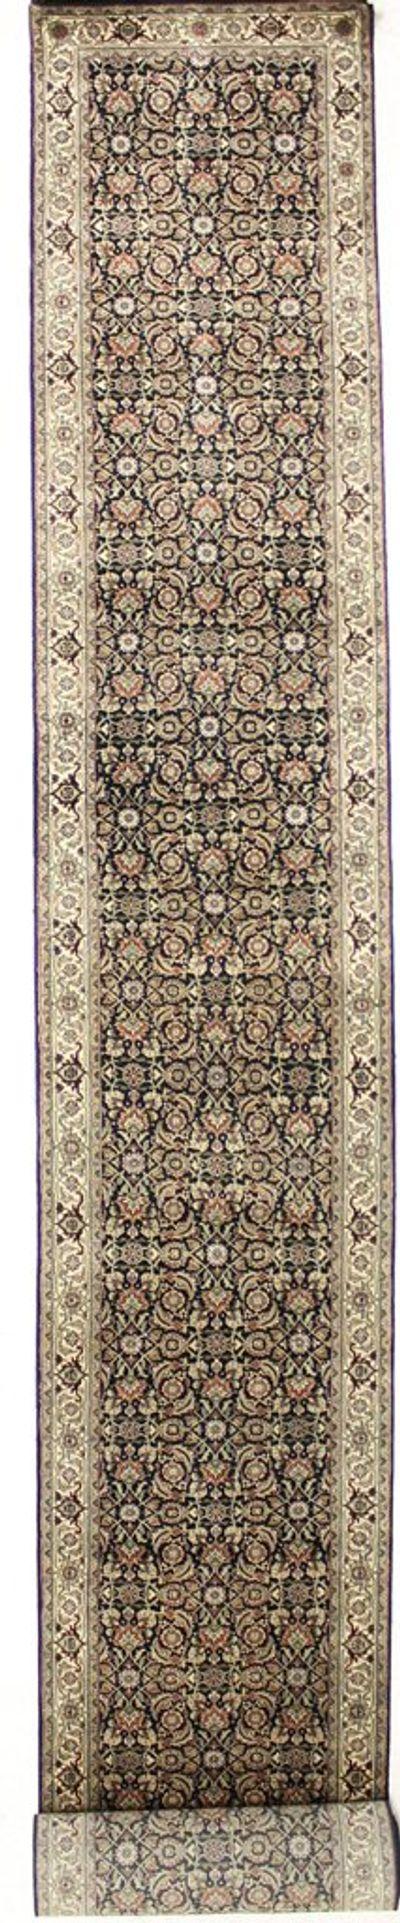 Black HERATI Rug #7533 • 2′7″ x 23′9″ • Wool on Cotton